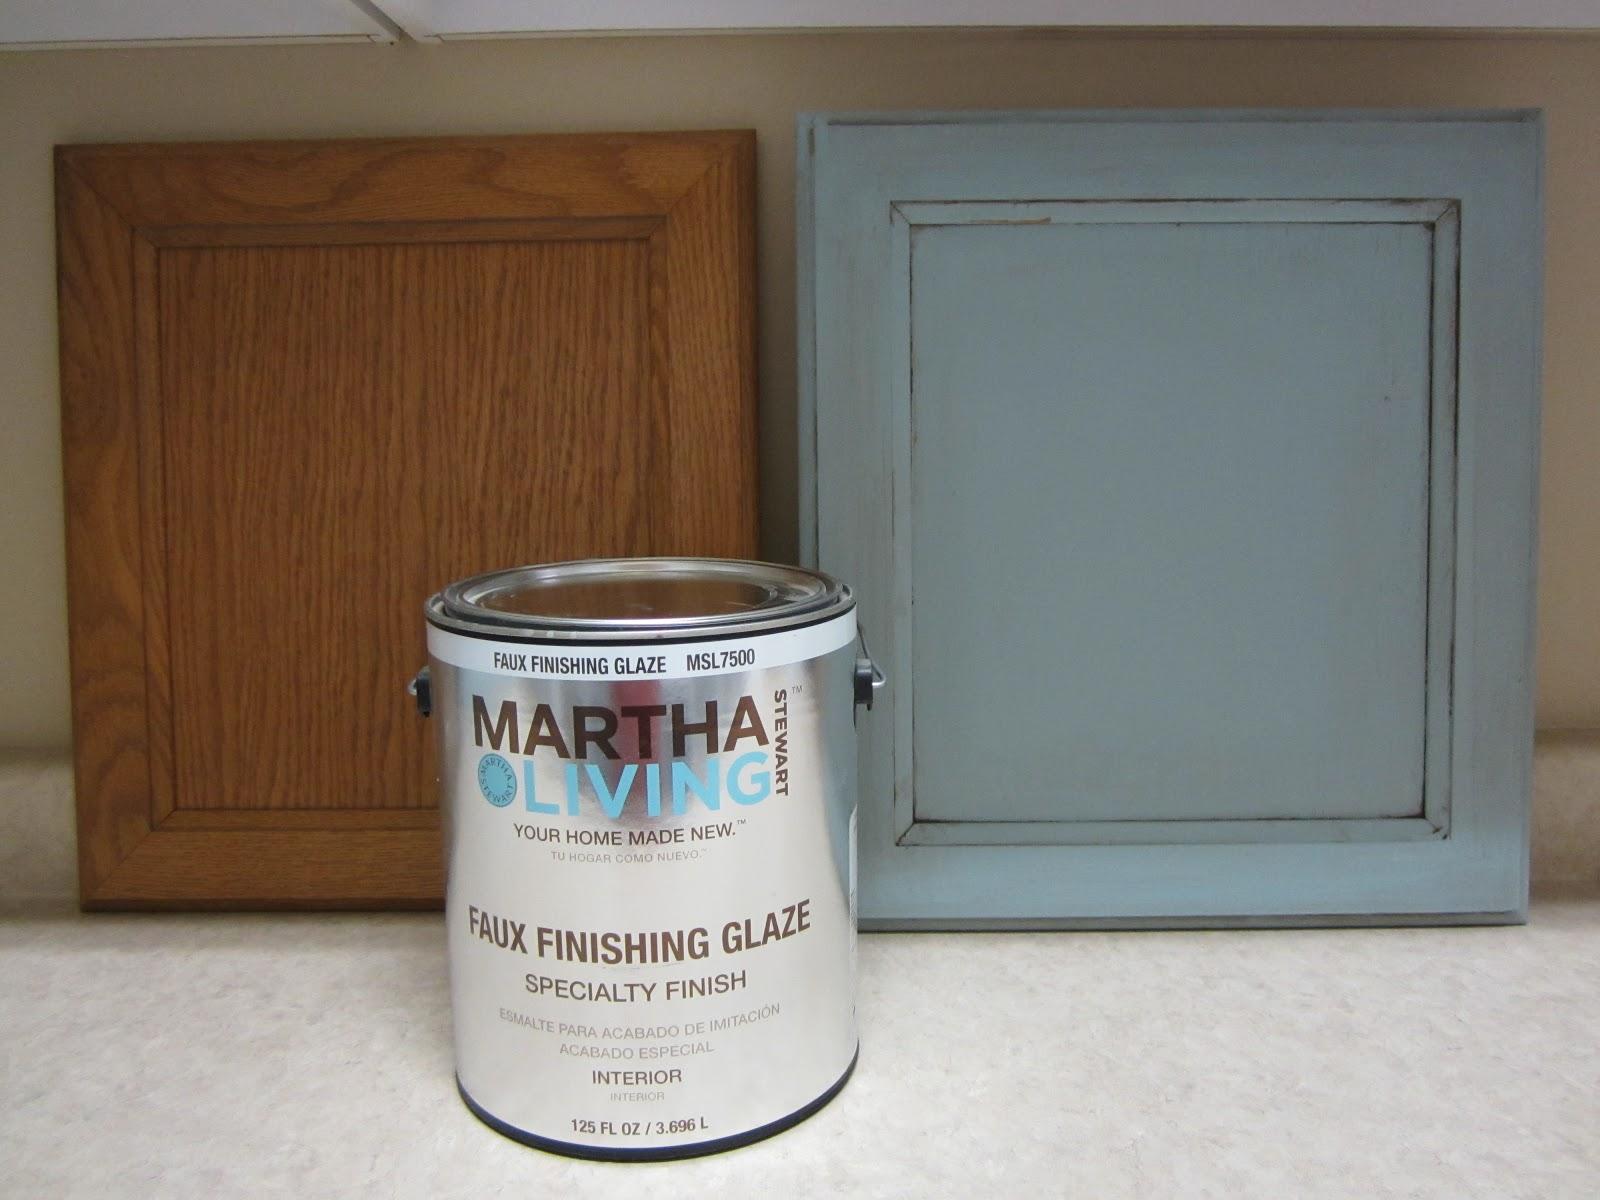 martha stewart living glaze